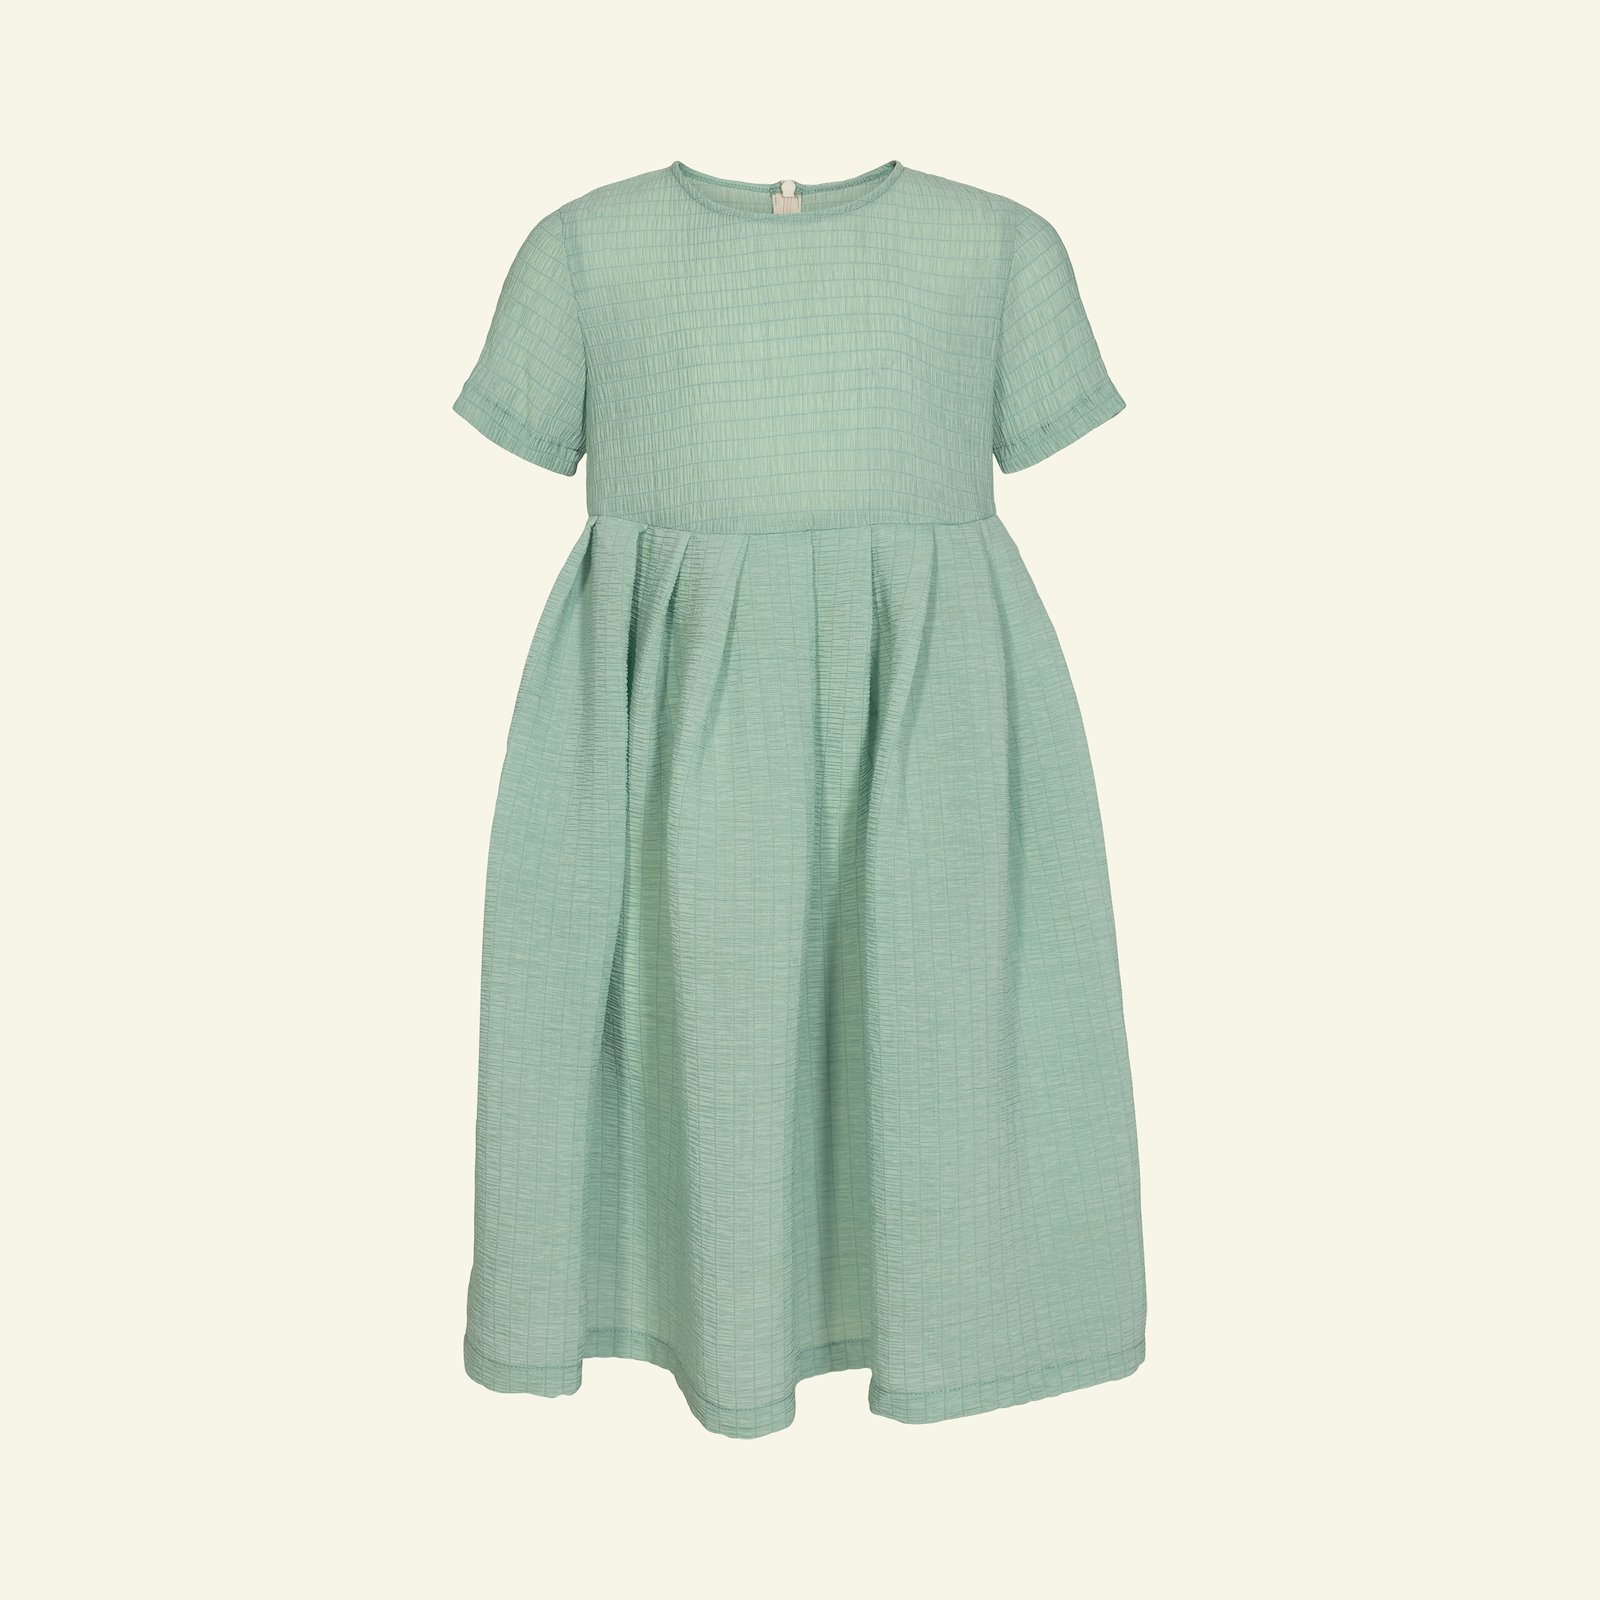 Dress, 104/4y p63059_560261_sskit